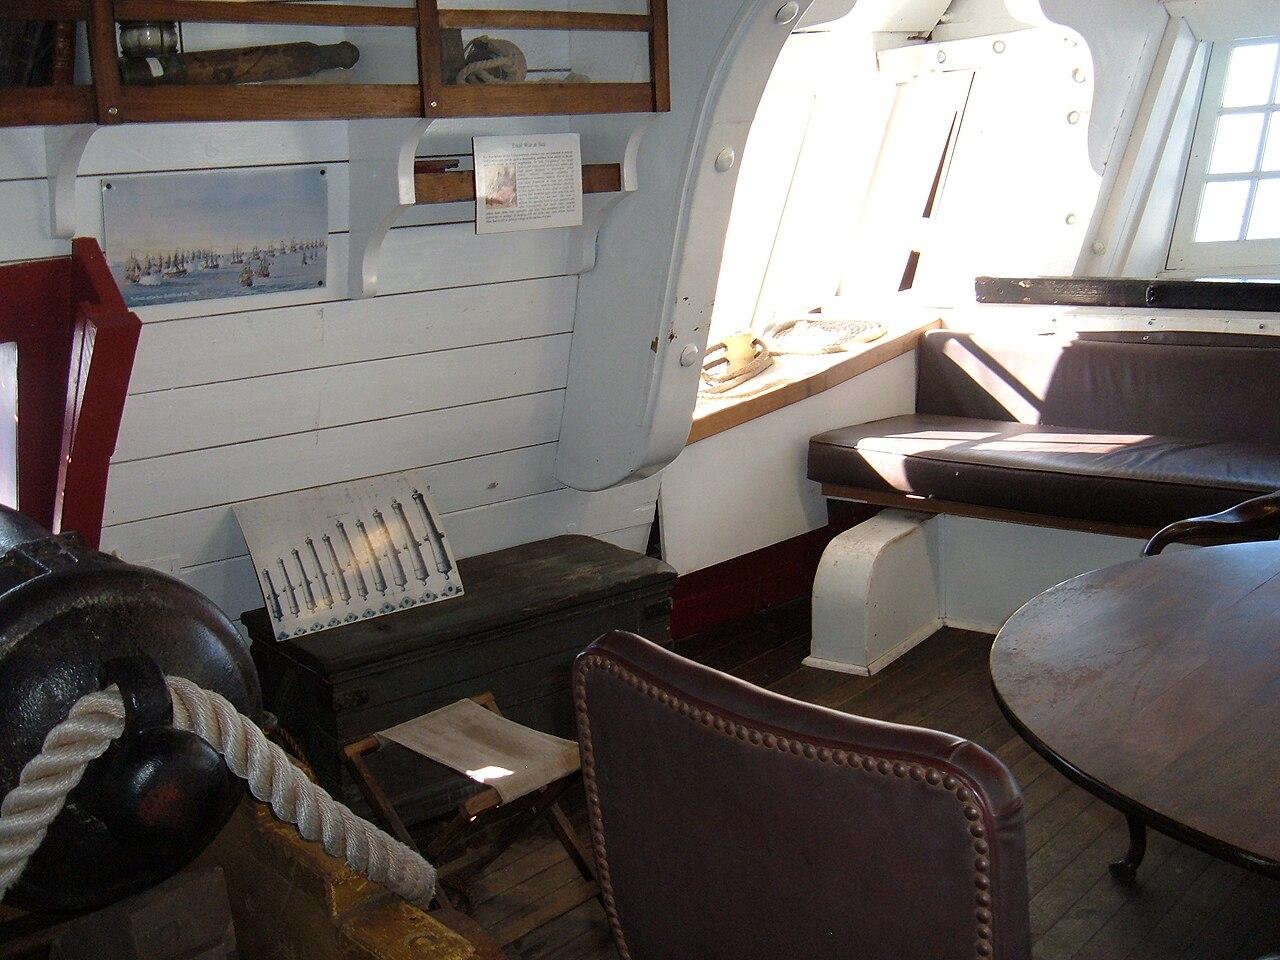 Archivo hms surprise replica ship captain 39 s cabin 2 jpg for Captain s cabin